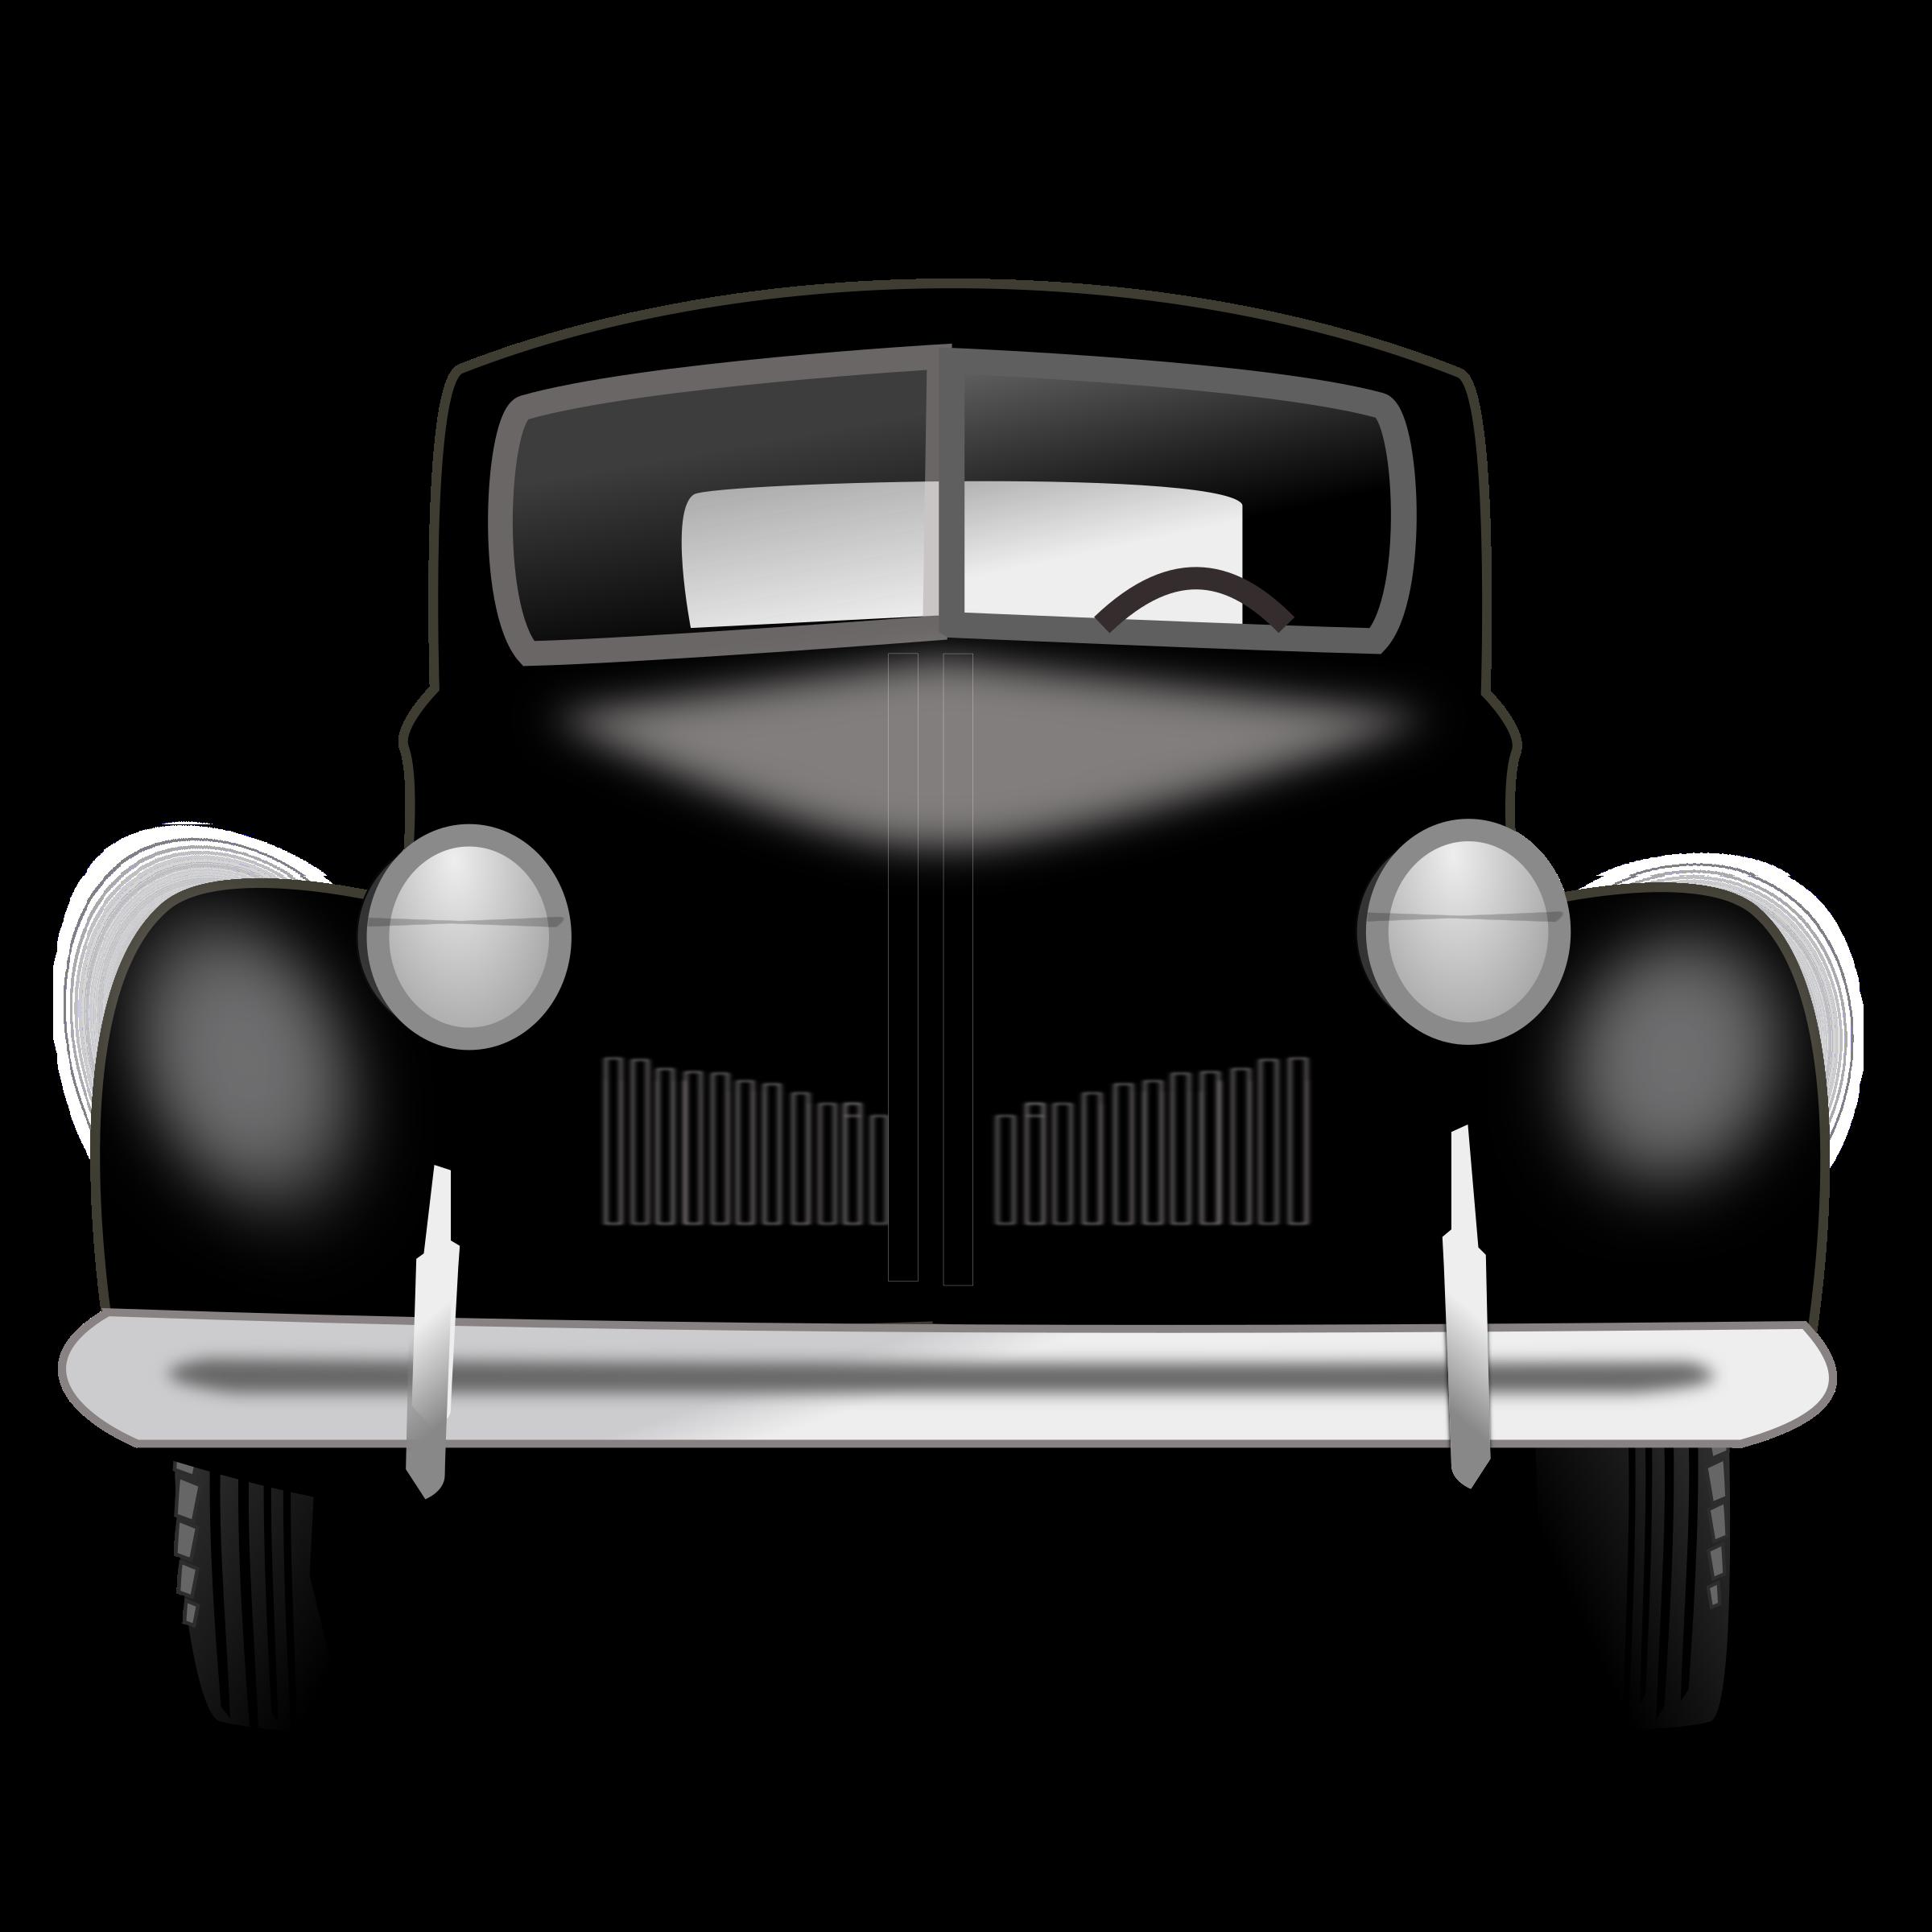 Classic Car clipart front view Clipart car classic 3 classic